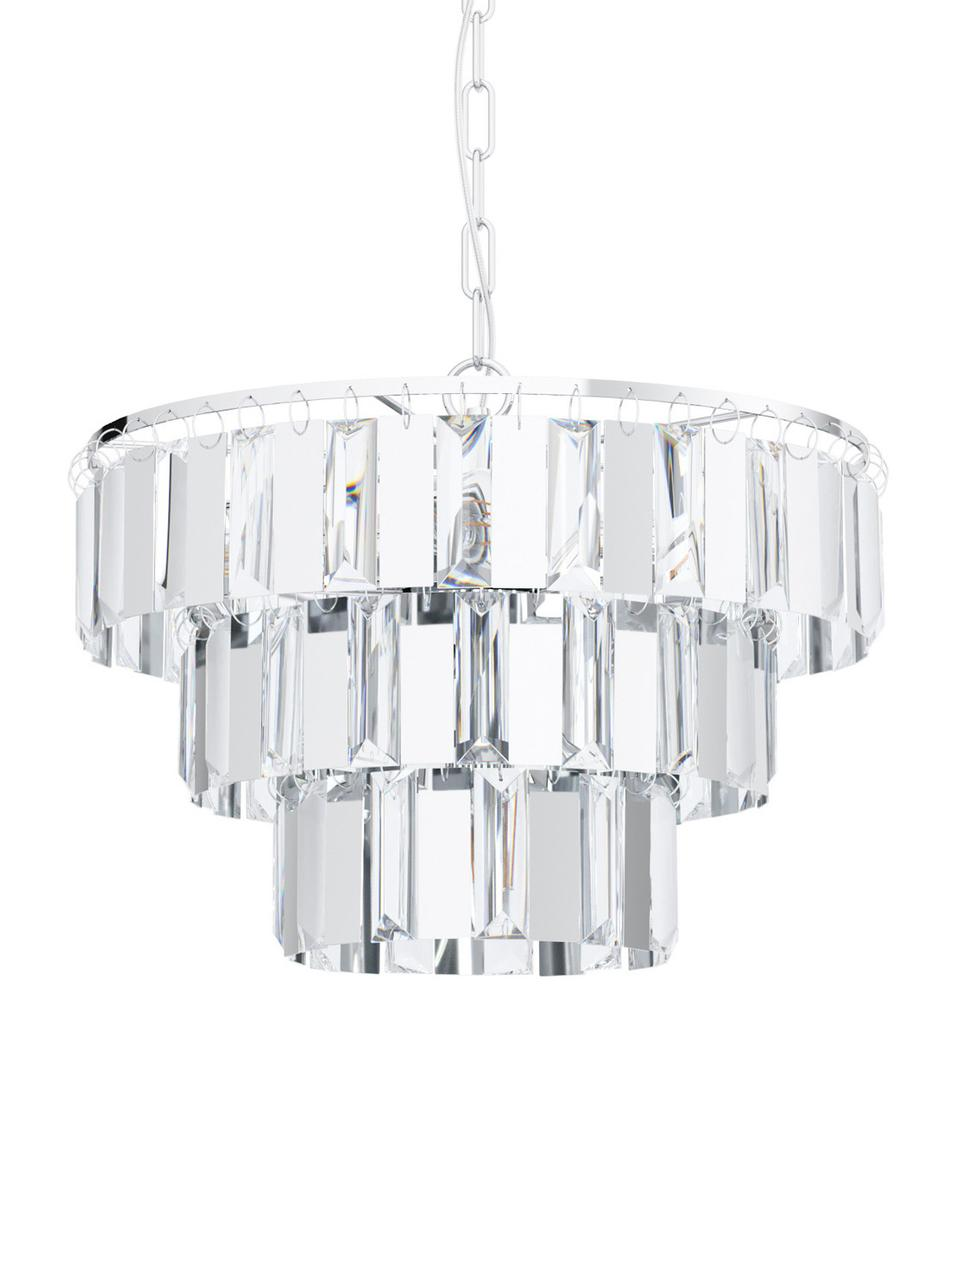 Kronleuchter Erseka aus Kristallglas, Lampenschirm: Kristallglas, Baldachin: Stahl, Transparent, Chrom, Ø 39 x H 130 cm